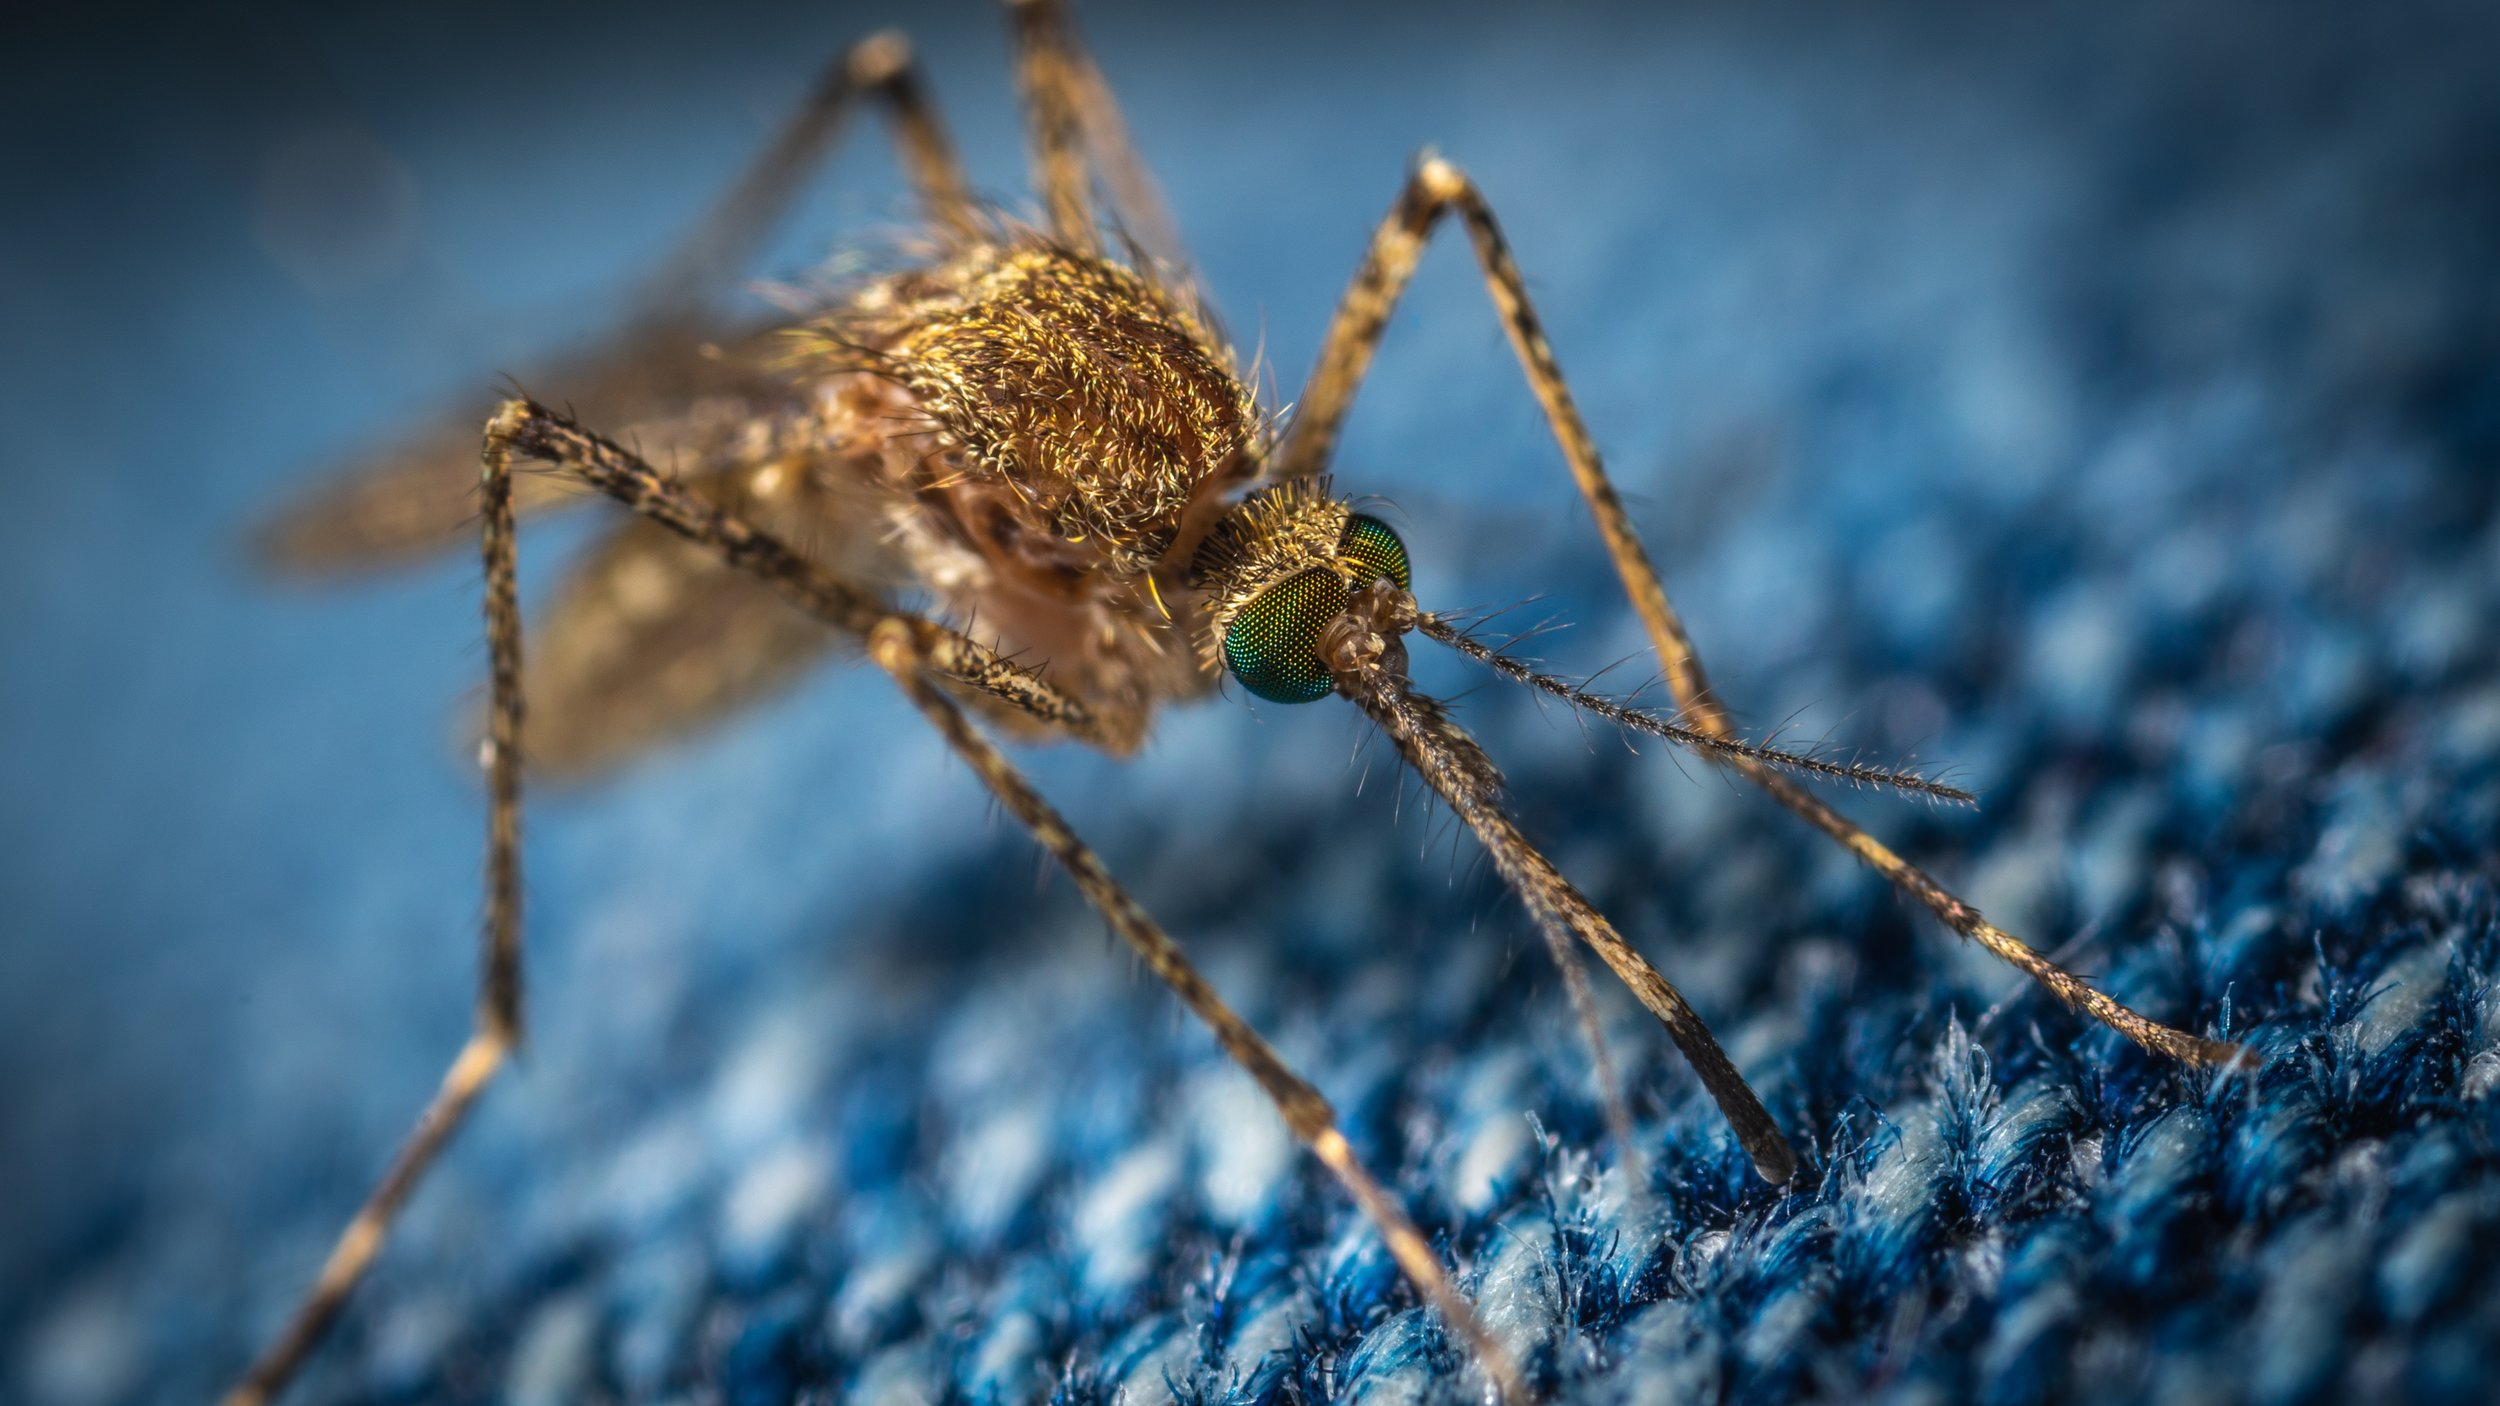 MALARIAPROPHYLAXE JA ODER NEIN? -